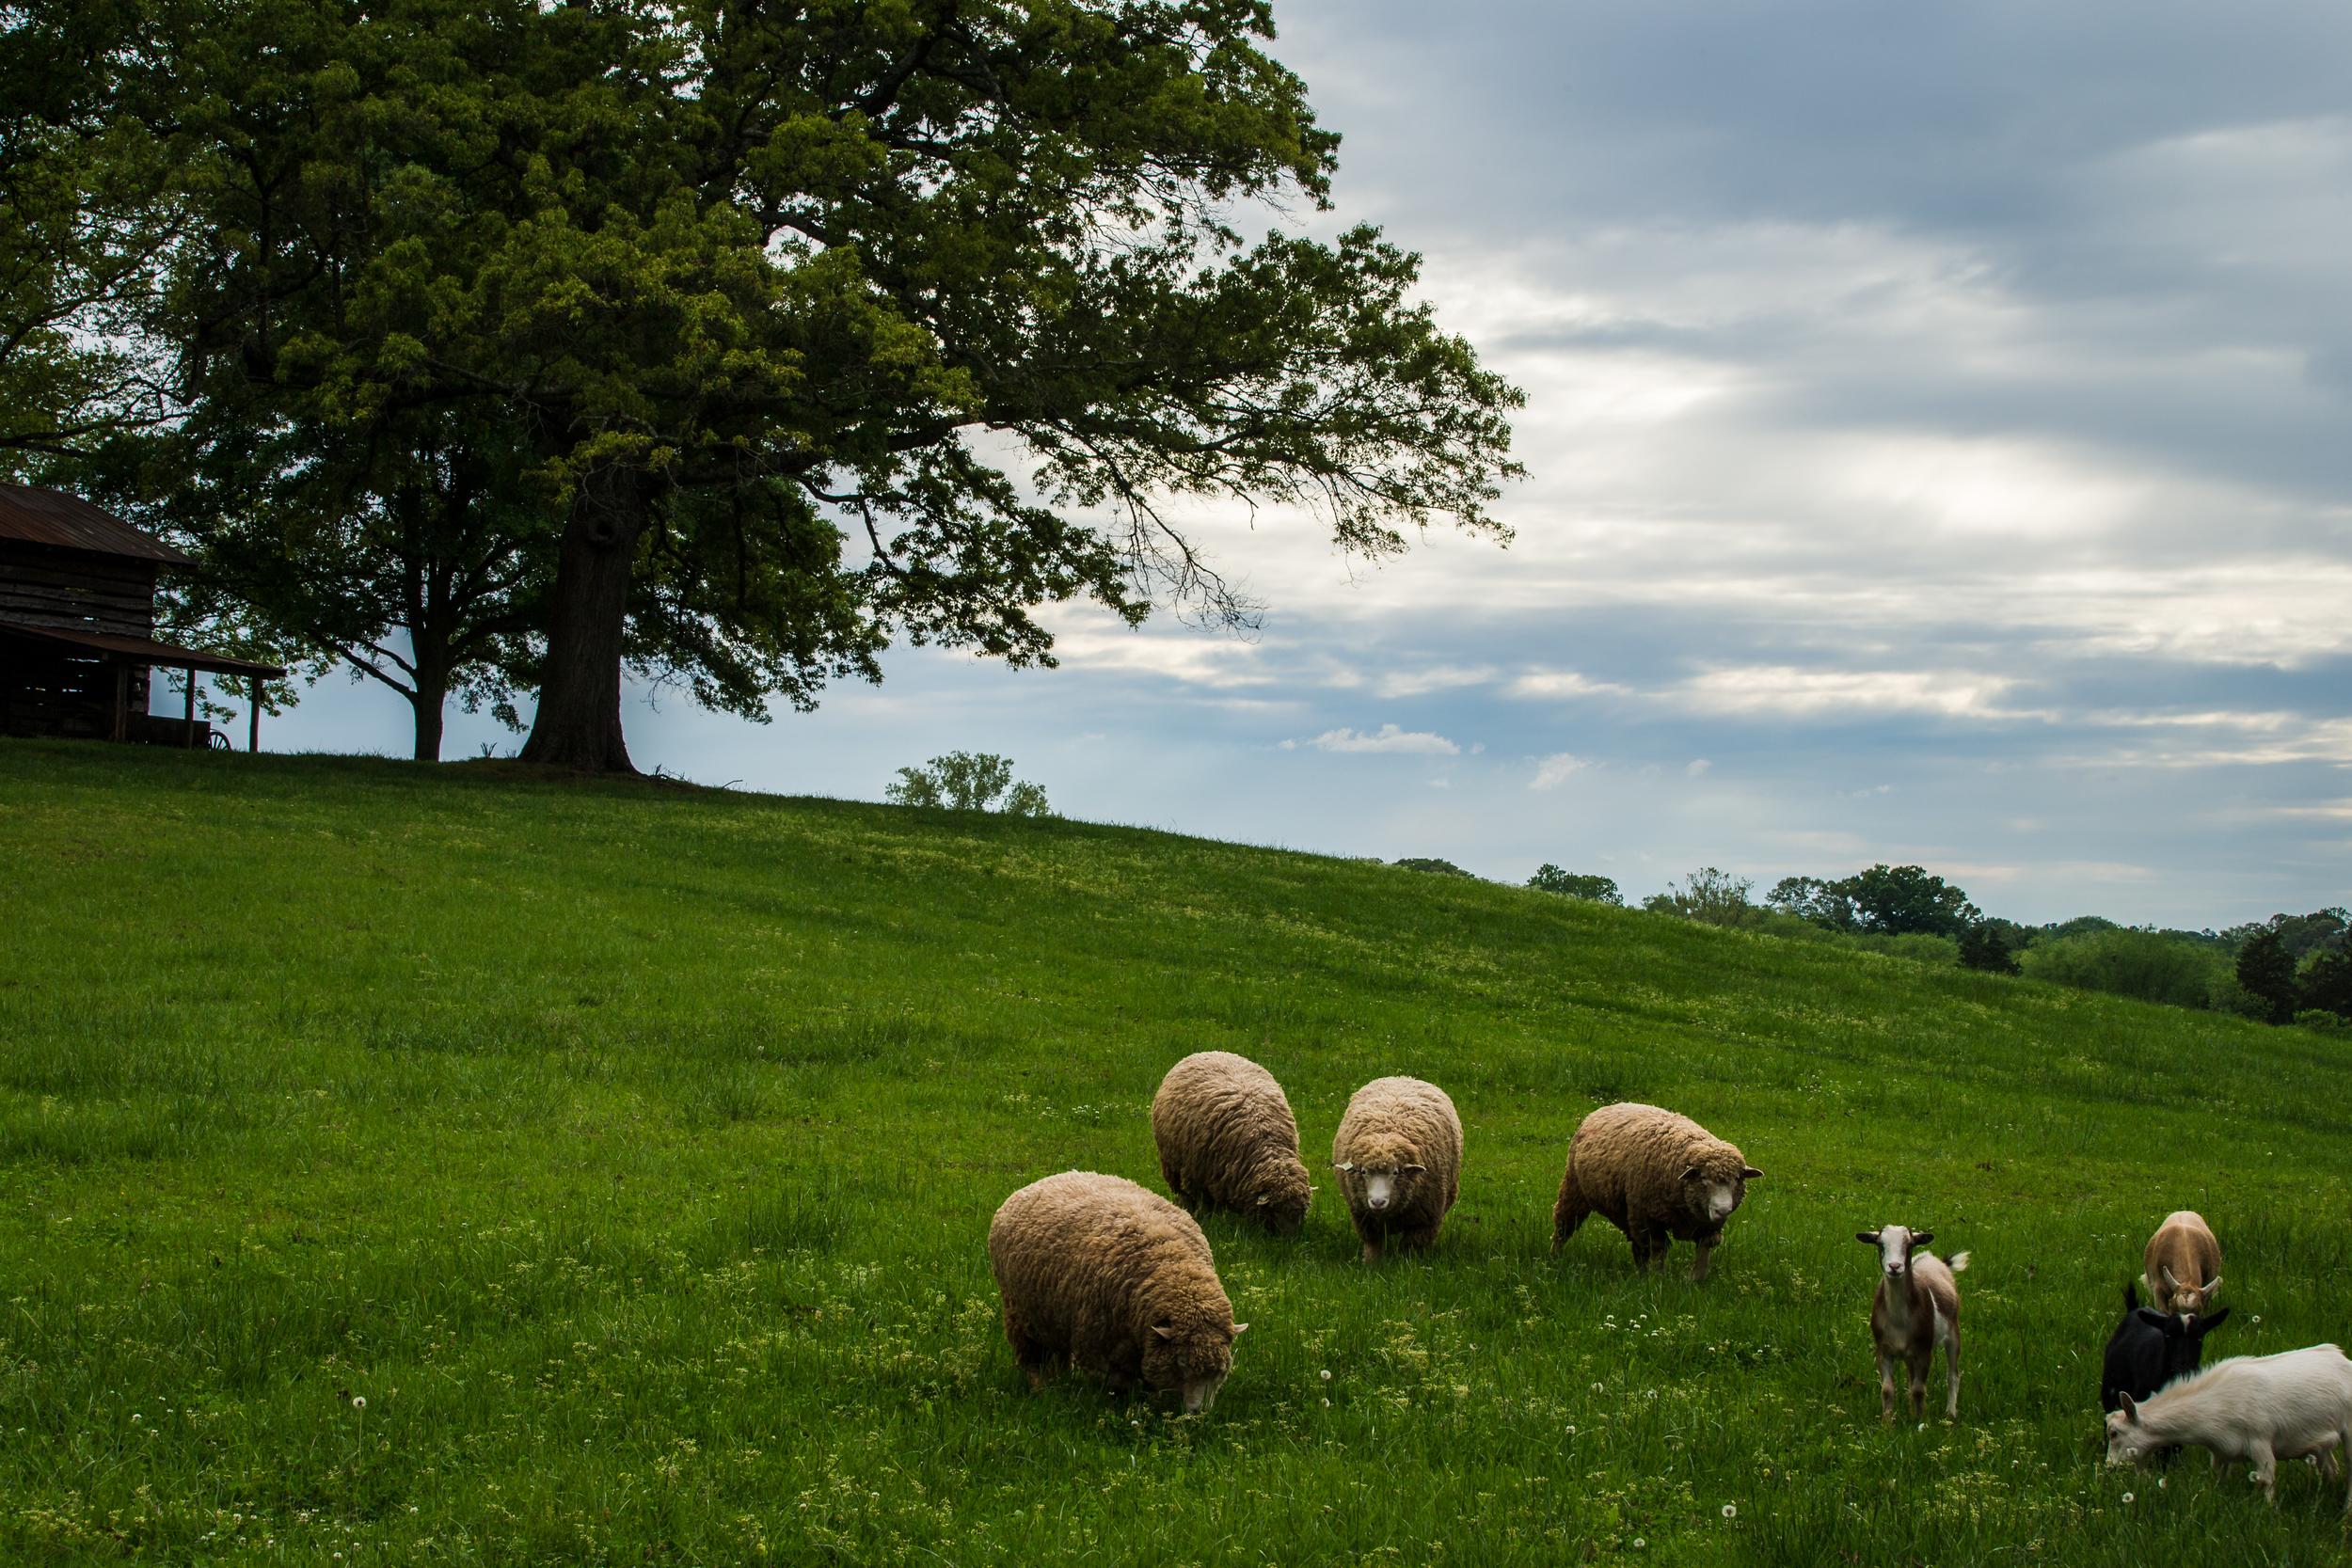 ©jennifer bailey 2015 north carolina countryside